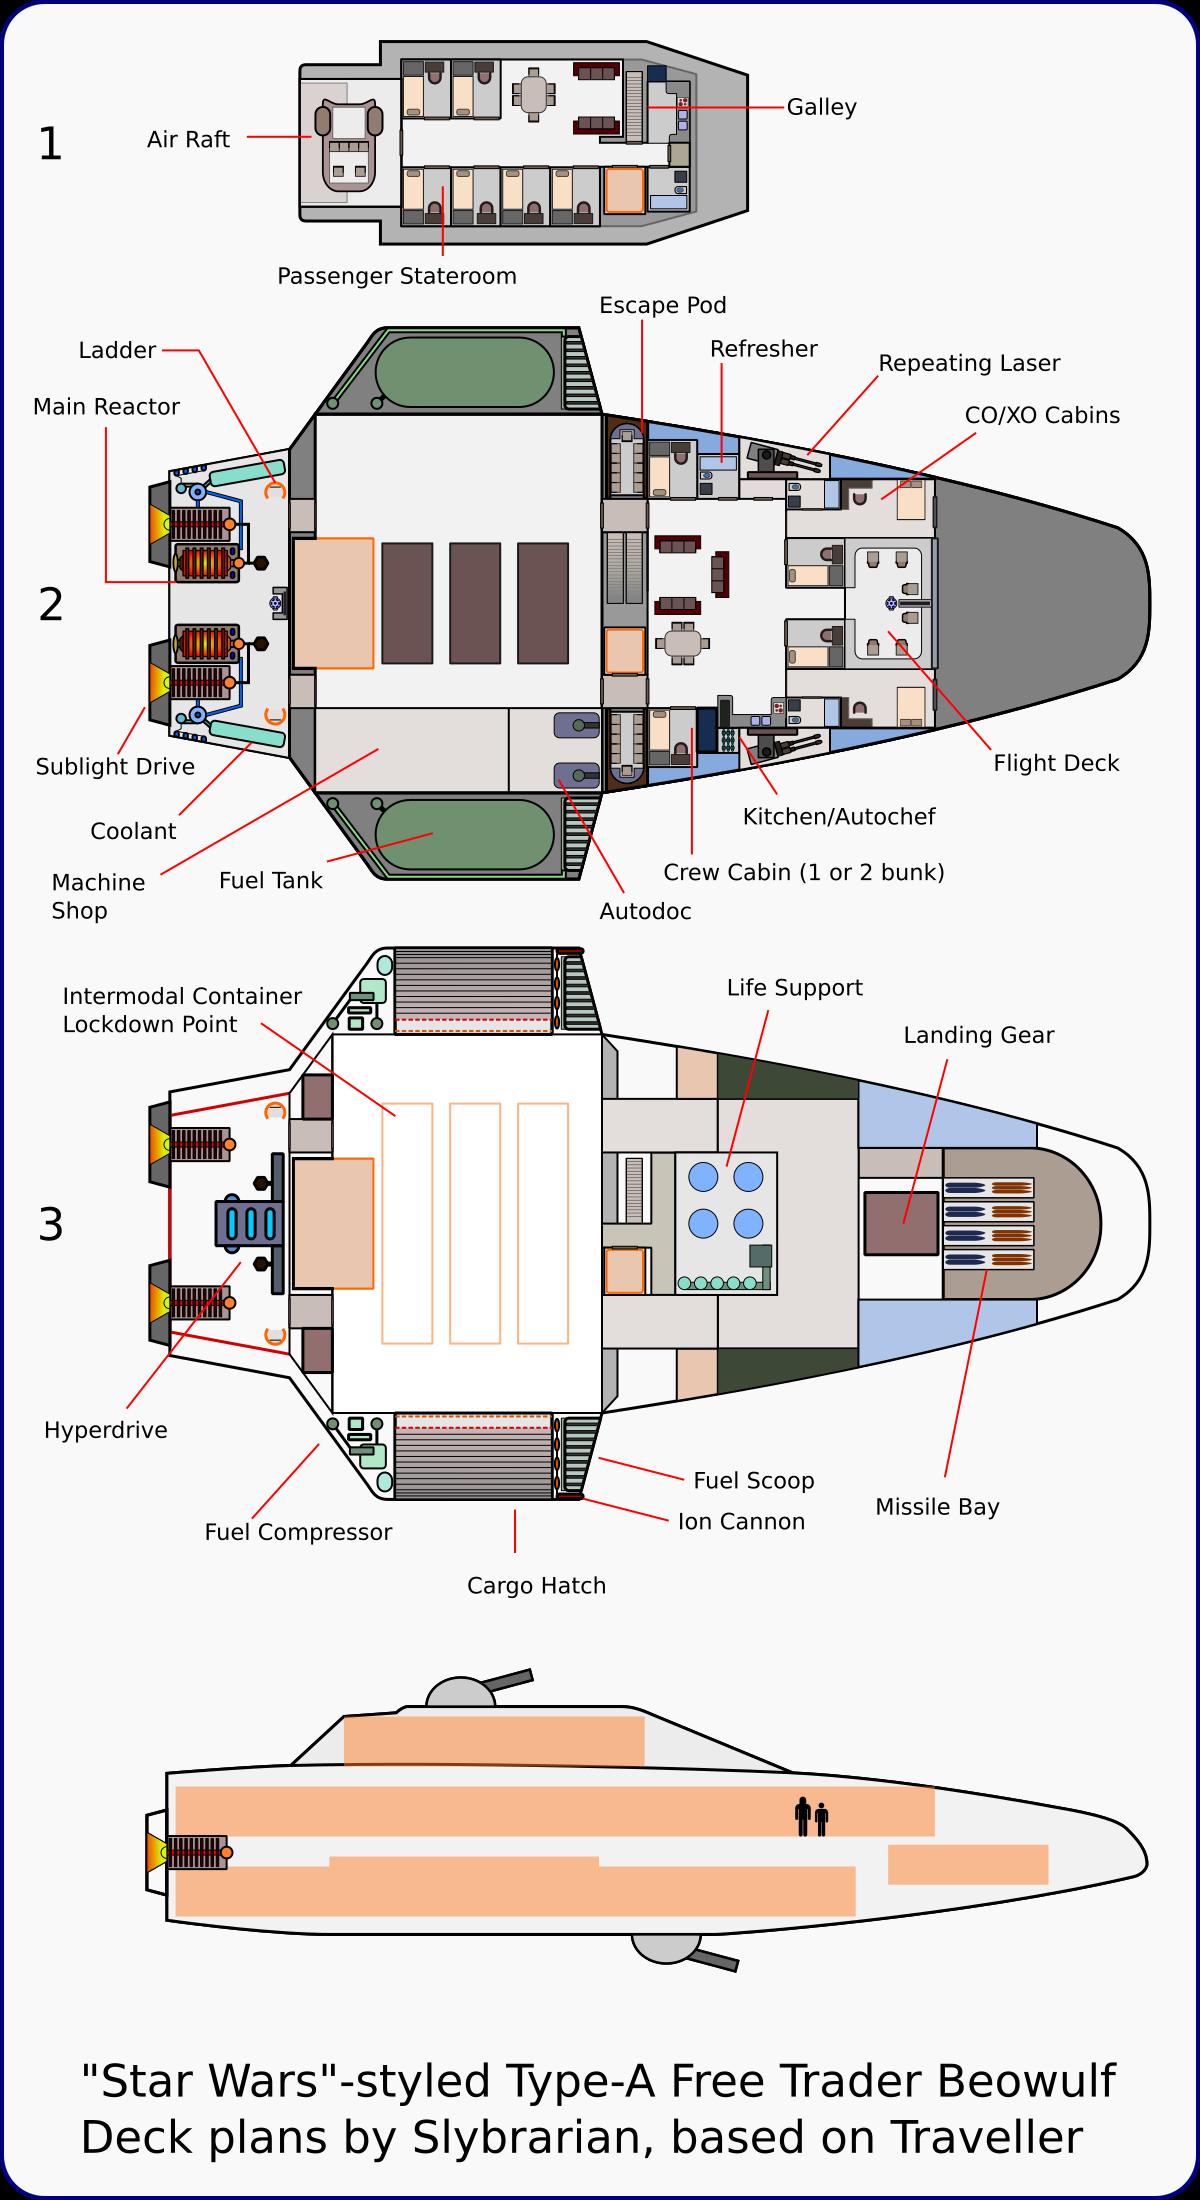 Starship Schematics And Deck Plans Miranda Class Starship